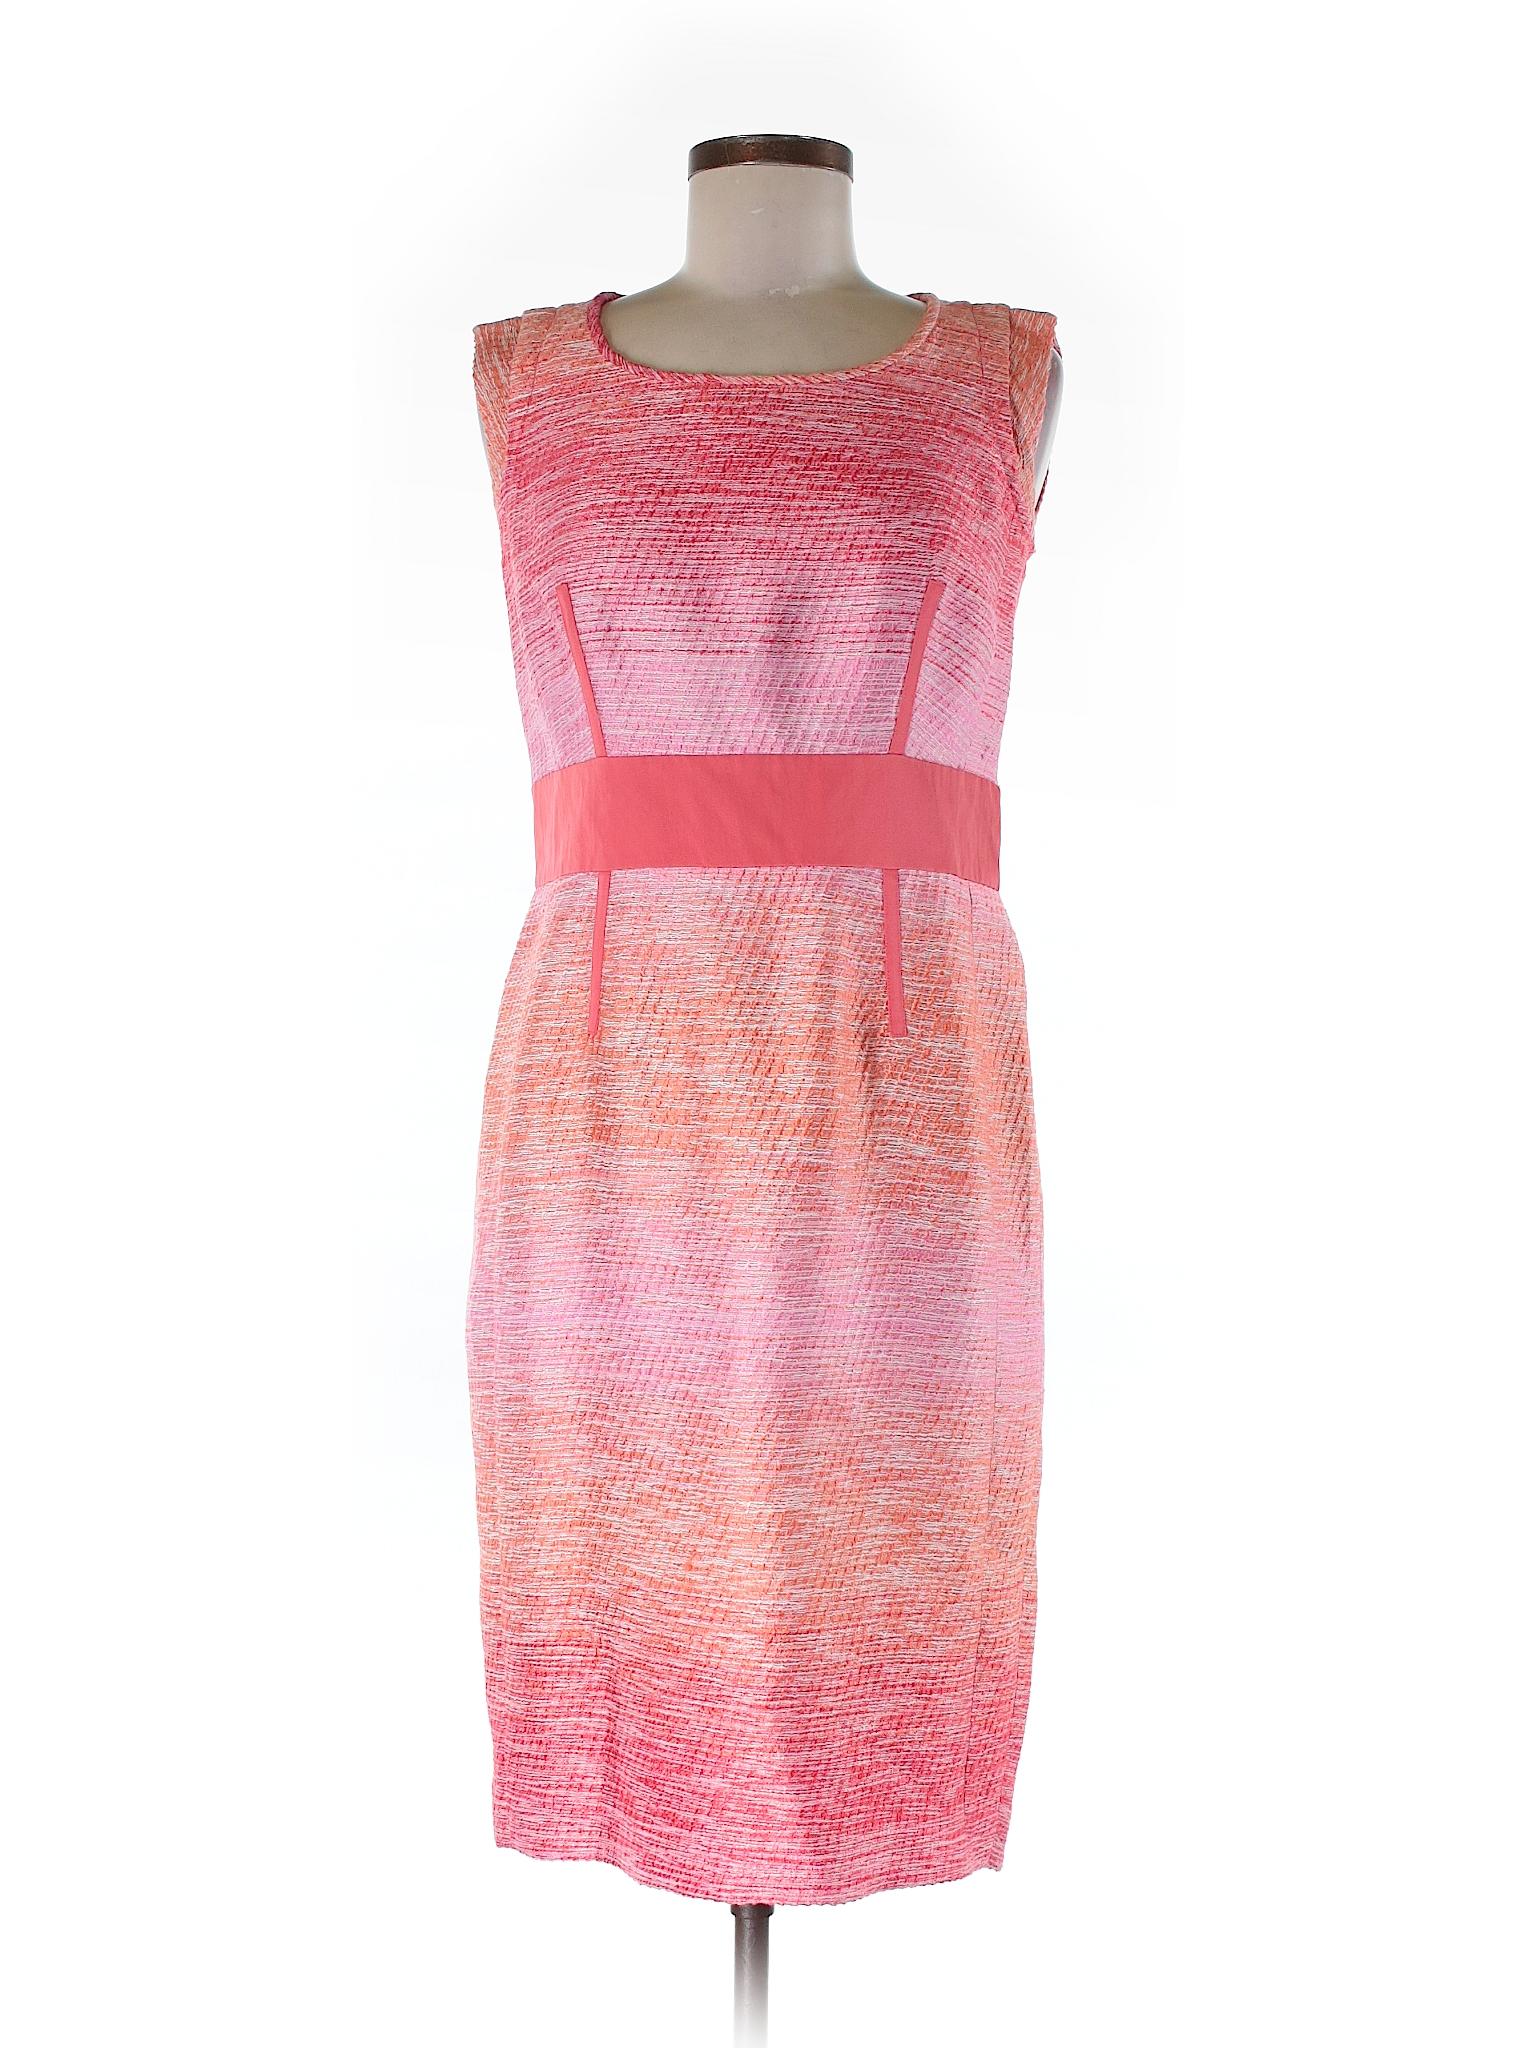 Lafayette New Casual 148 winter Boutique York Dress pqwxO5U16U